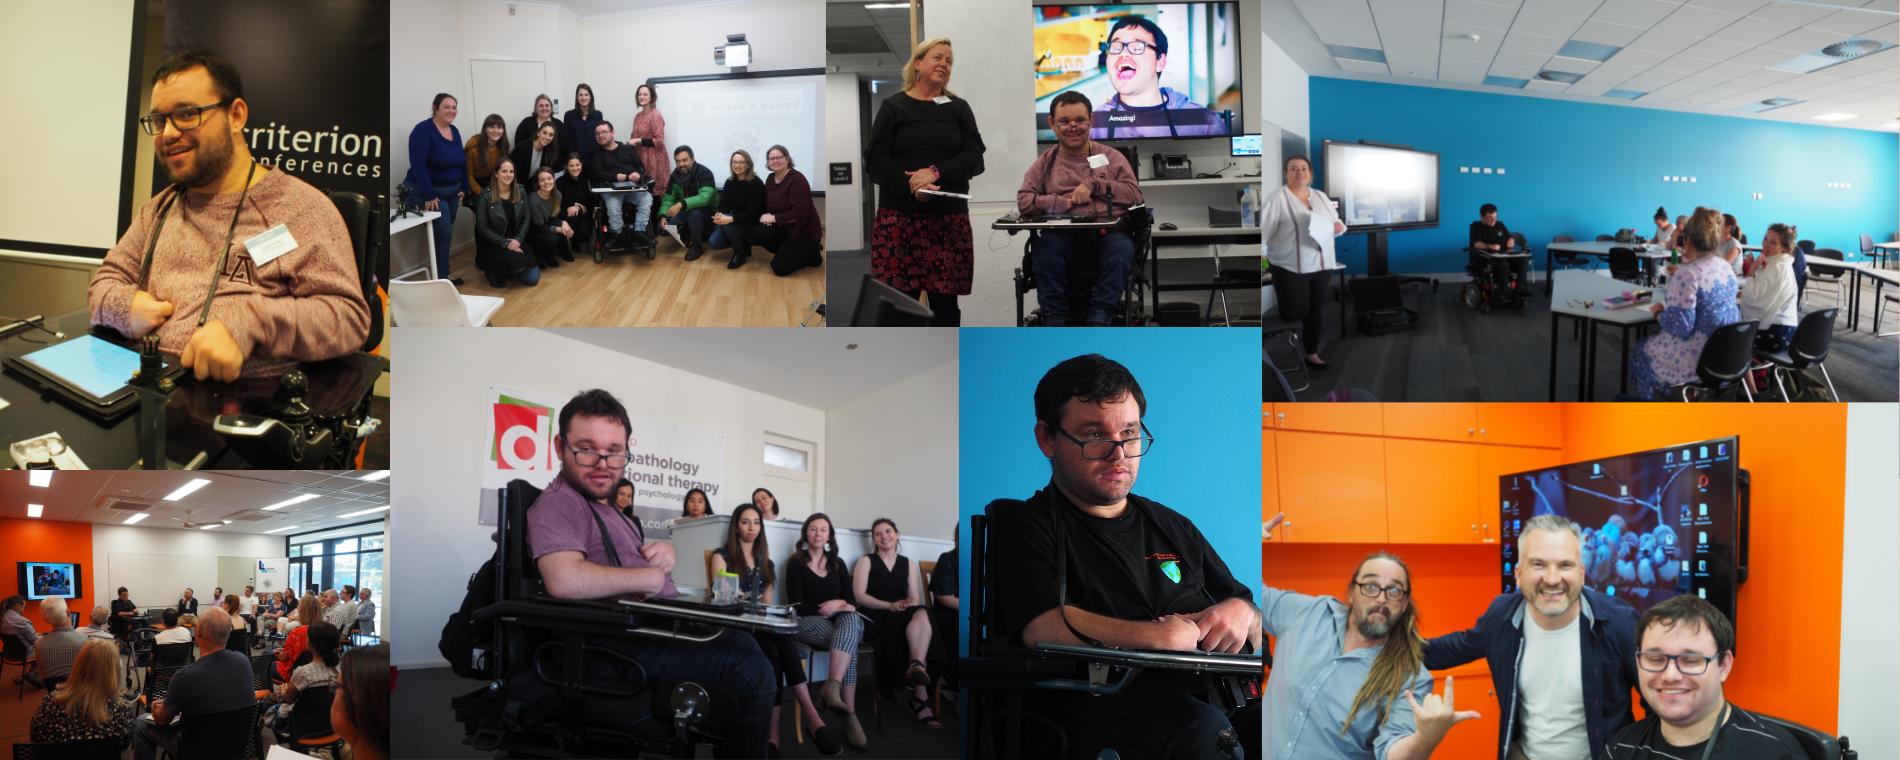 Image description: Collage of photos of Jono giving presentations.